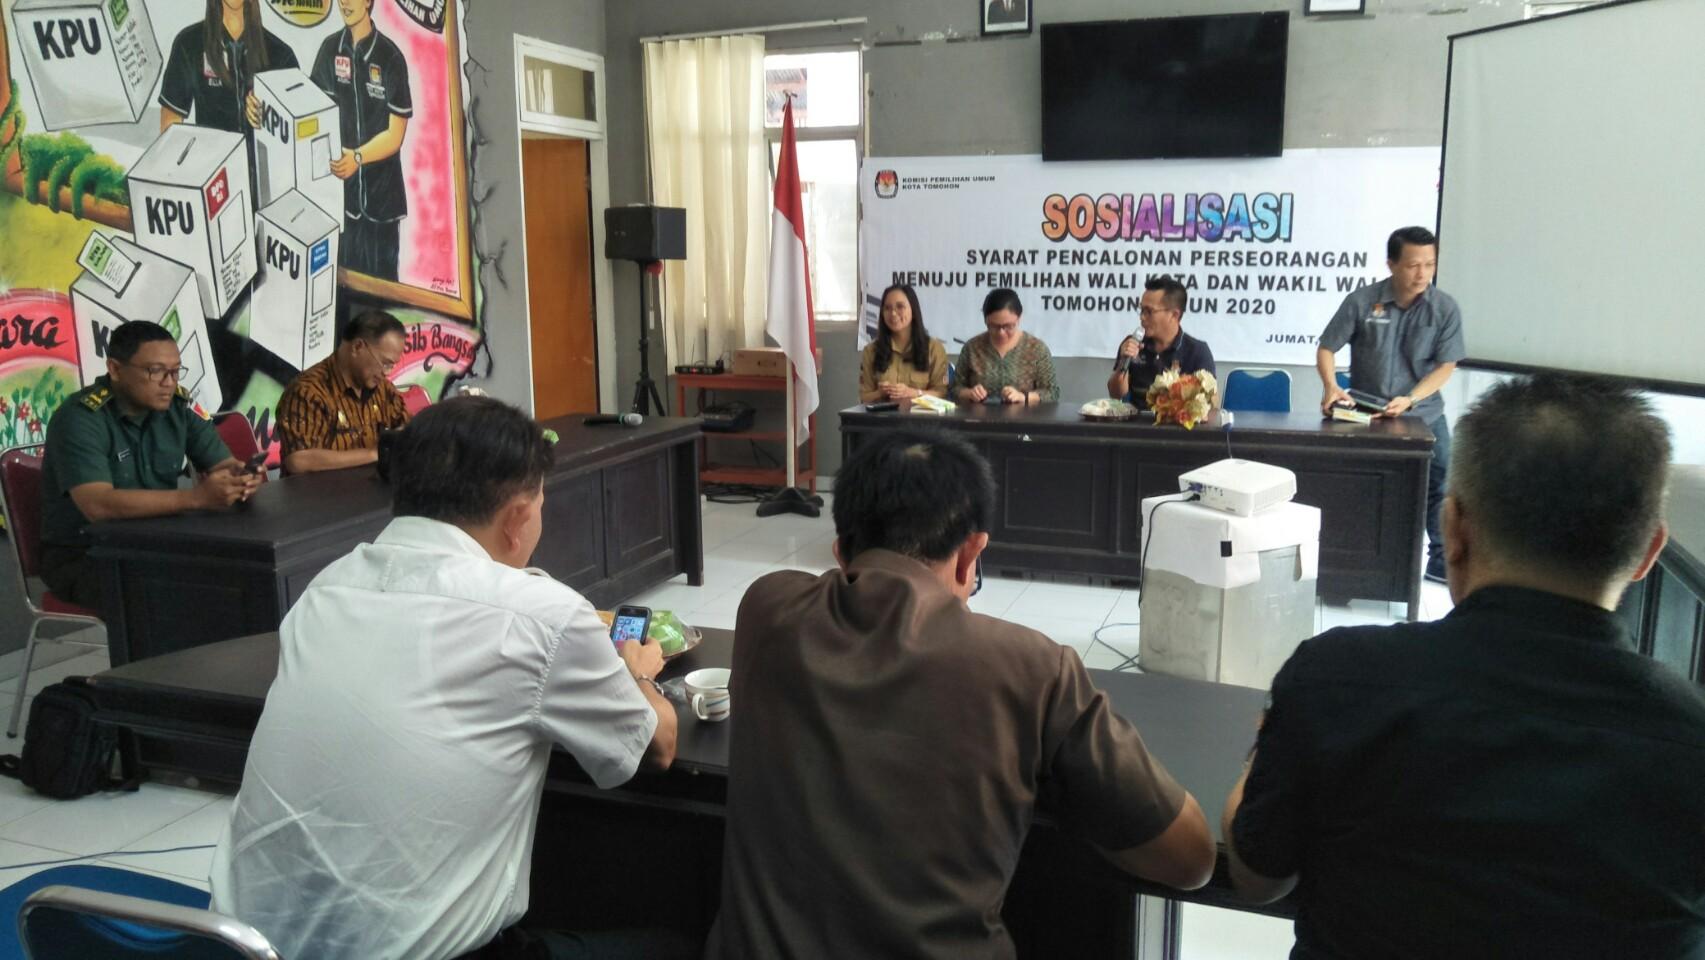 KPU Tomohon Sosialisasi Pencalonan Perseorangan Pilkada 2020